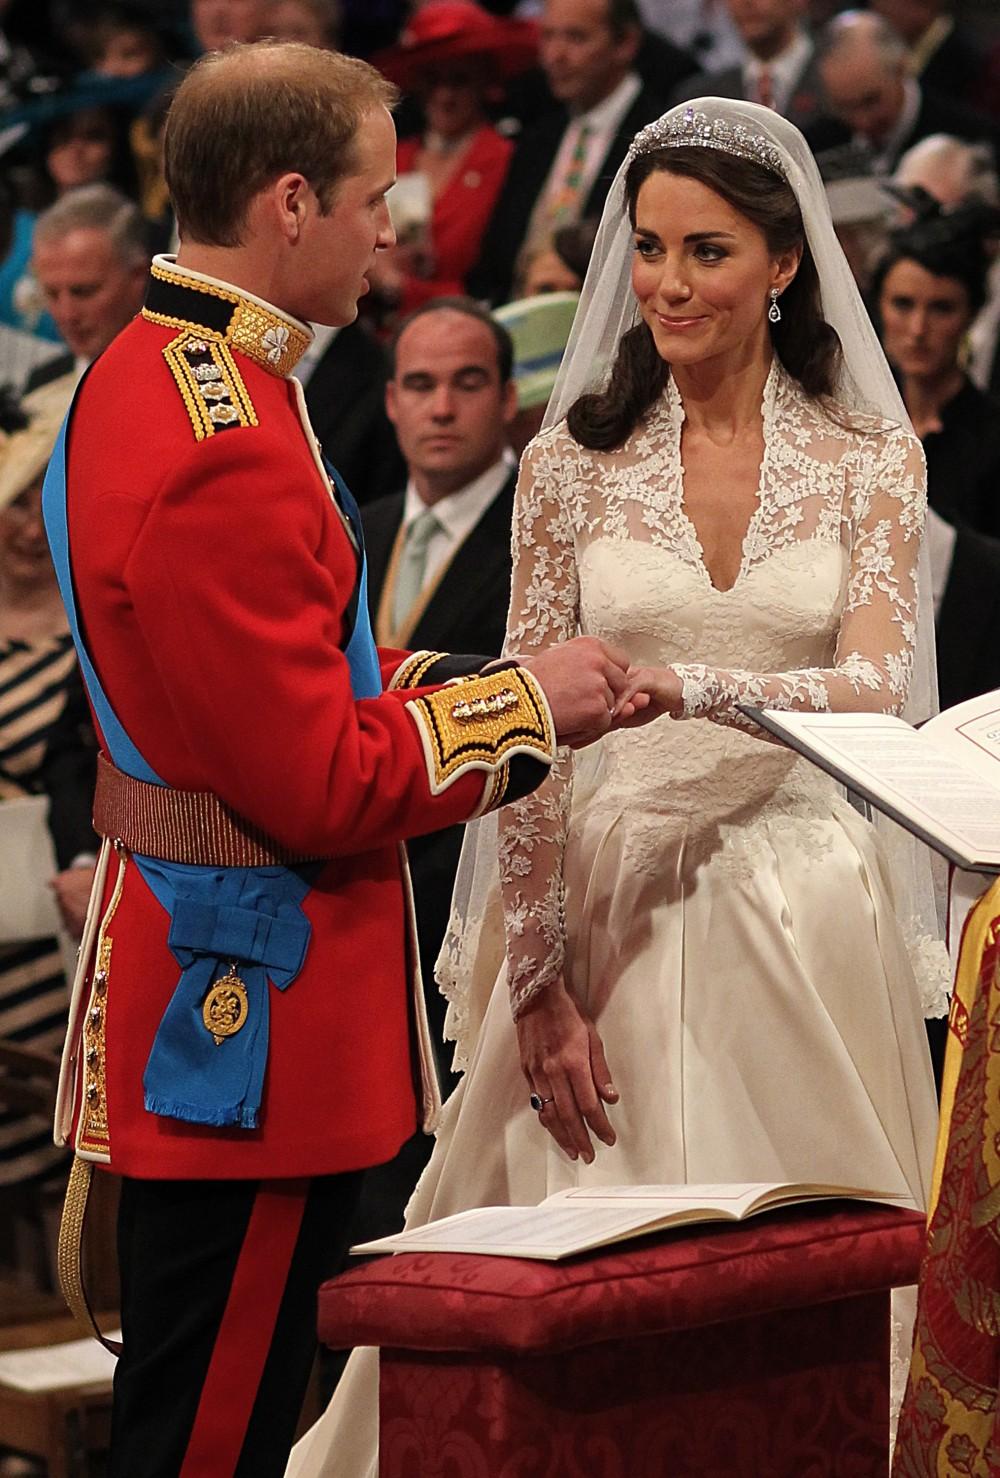 93109 prince william and kate middleton - Kate Middleton Prince William Honeymoon